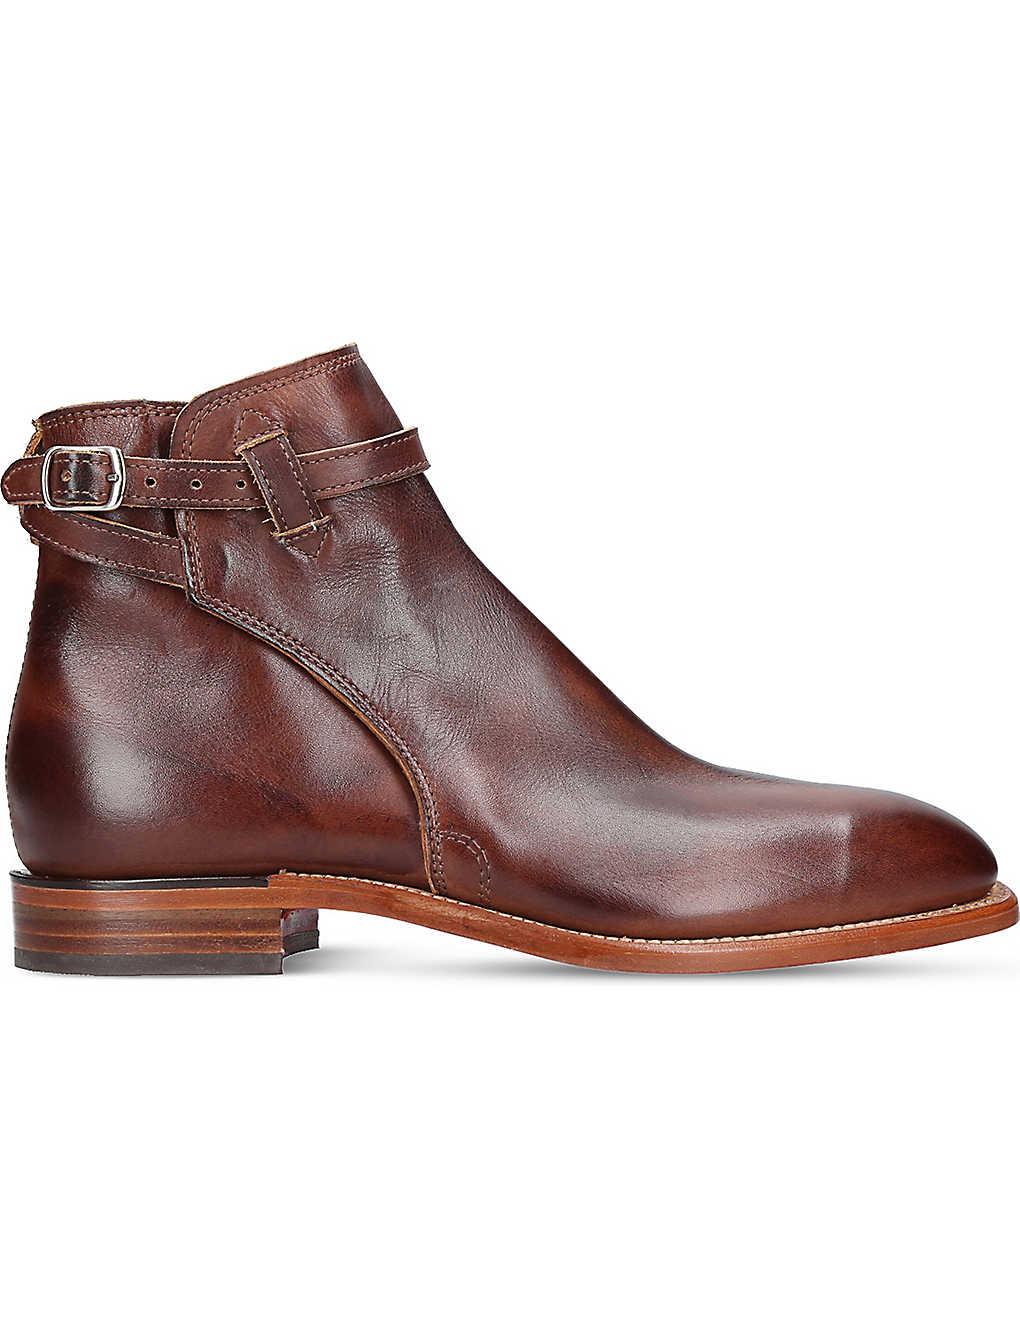 646727a4168 R M WILLIAMS - Stockmans leather buckle boot | Selfridges.com